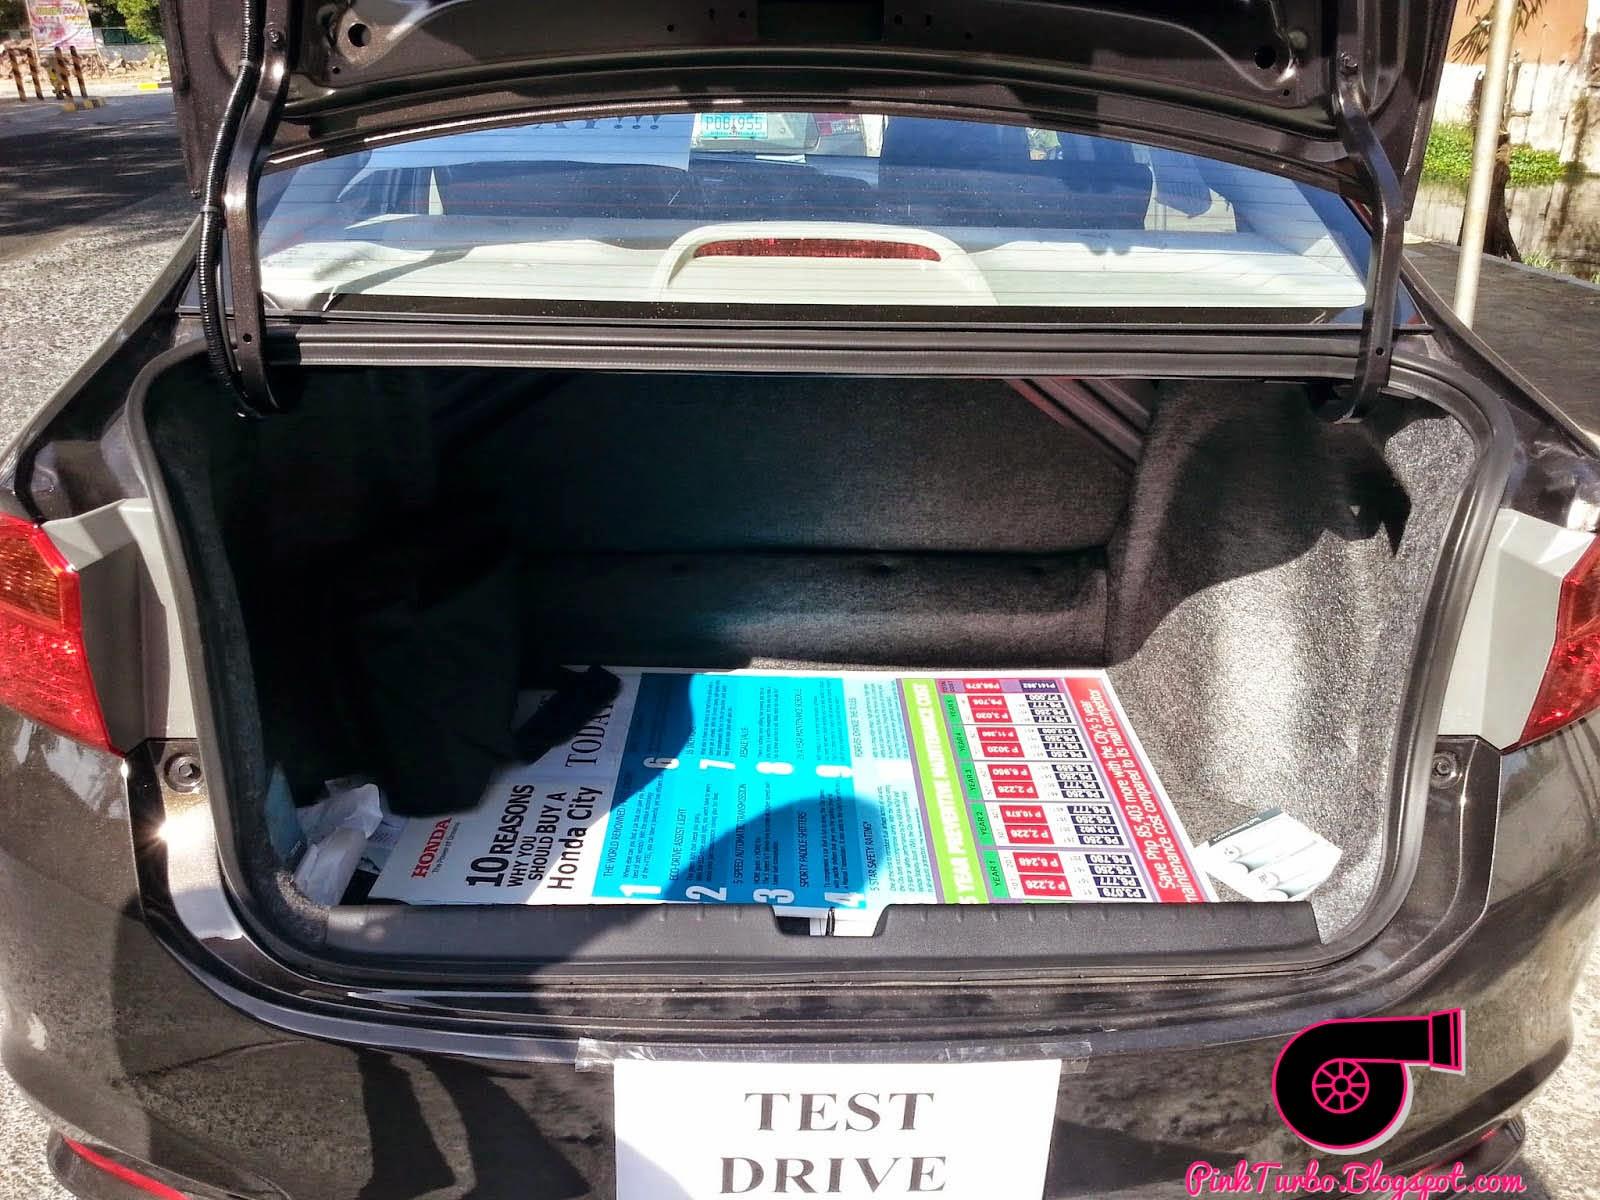 Pink Turbo: Test Driving the 2014 Honda City!